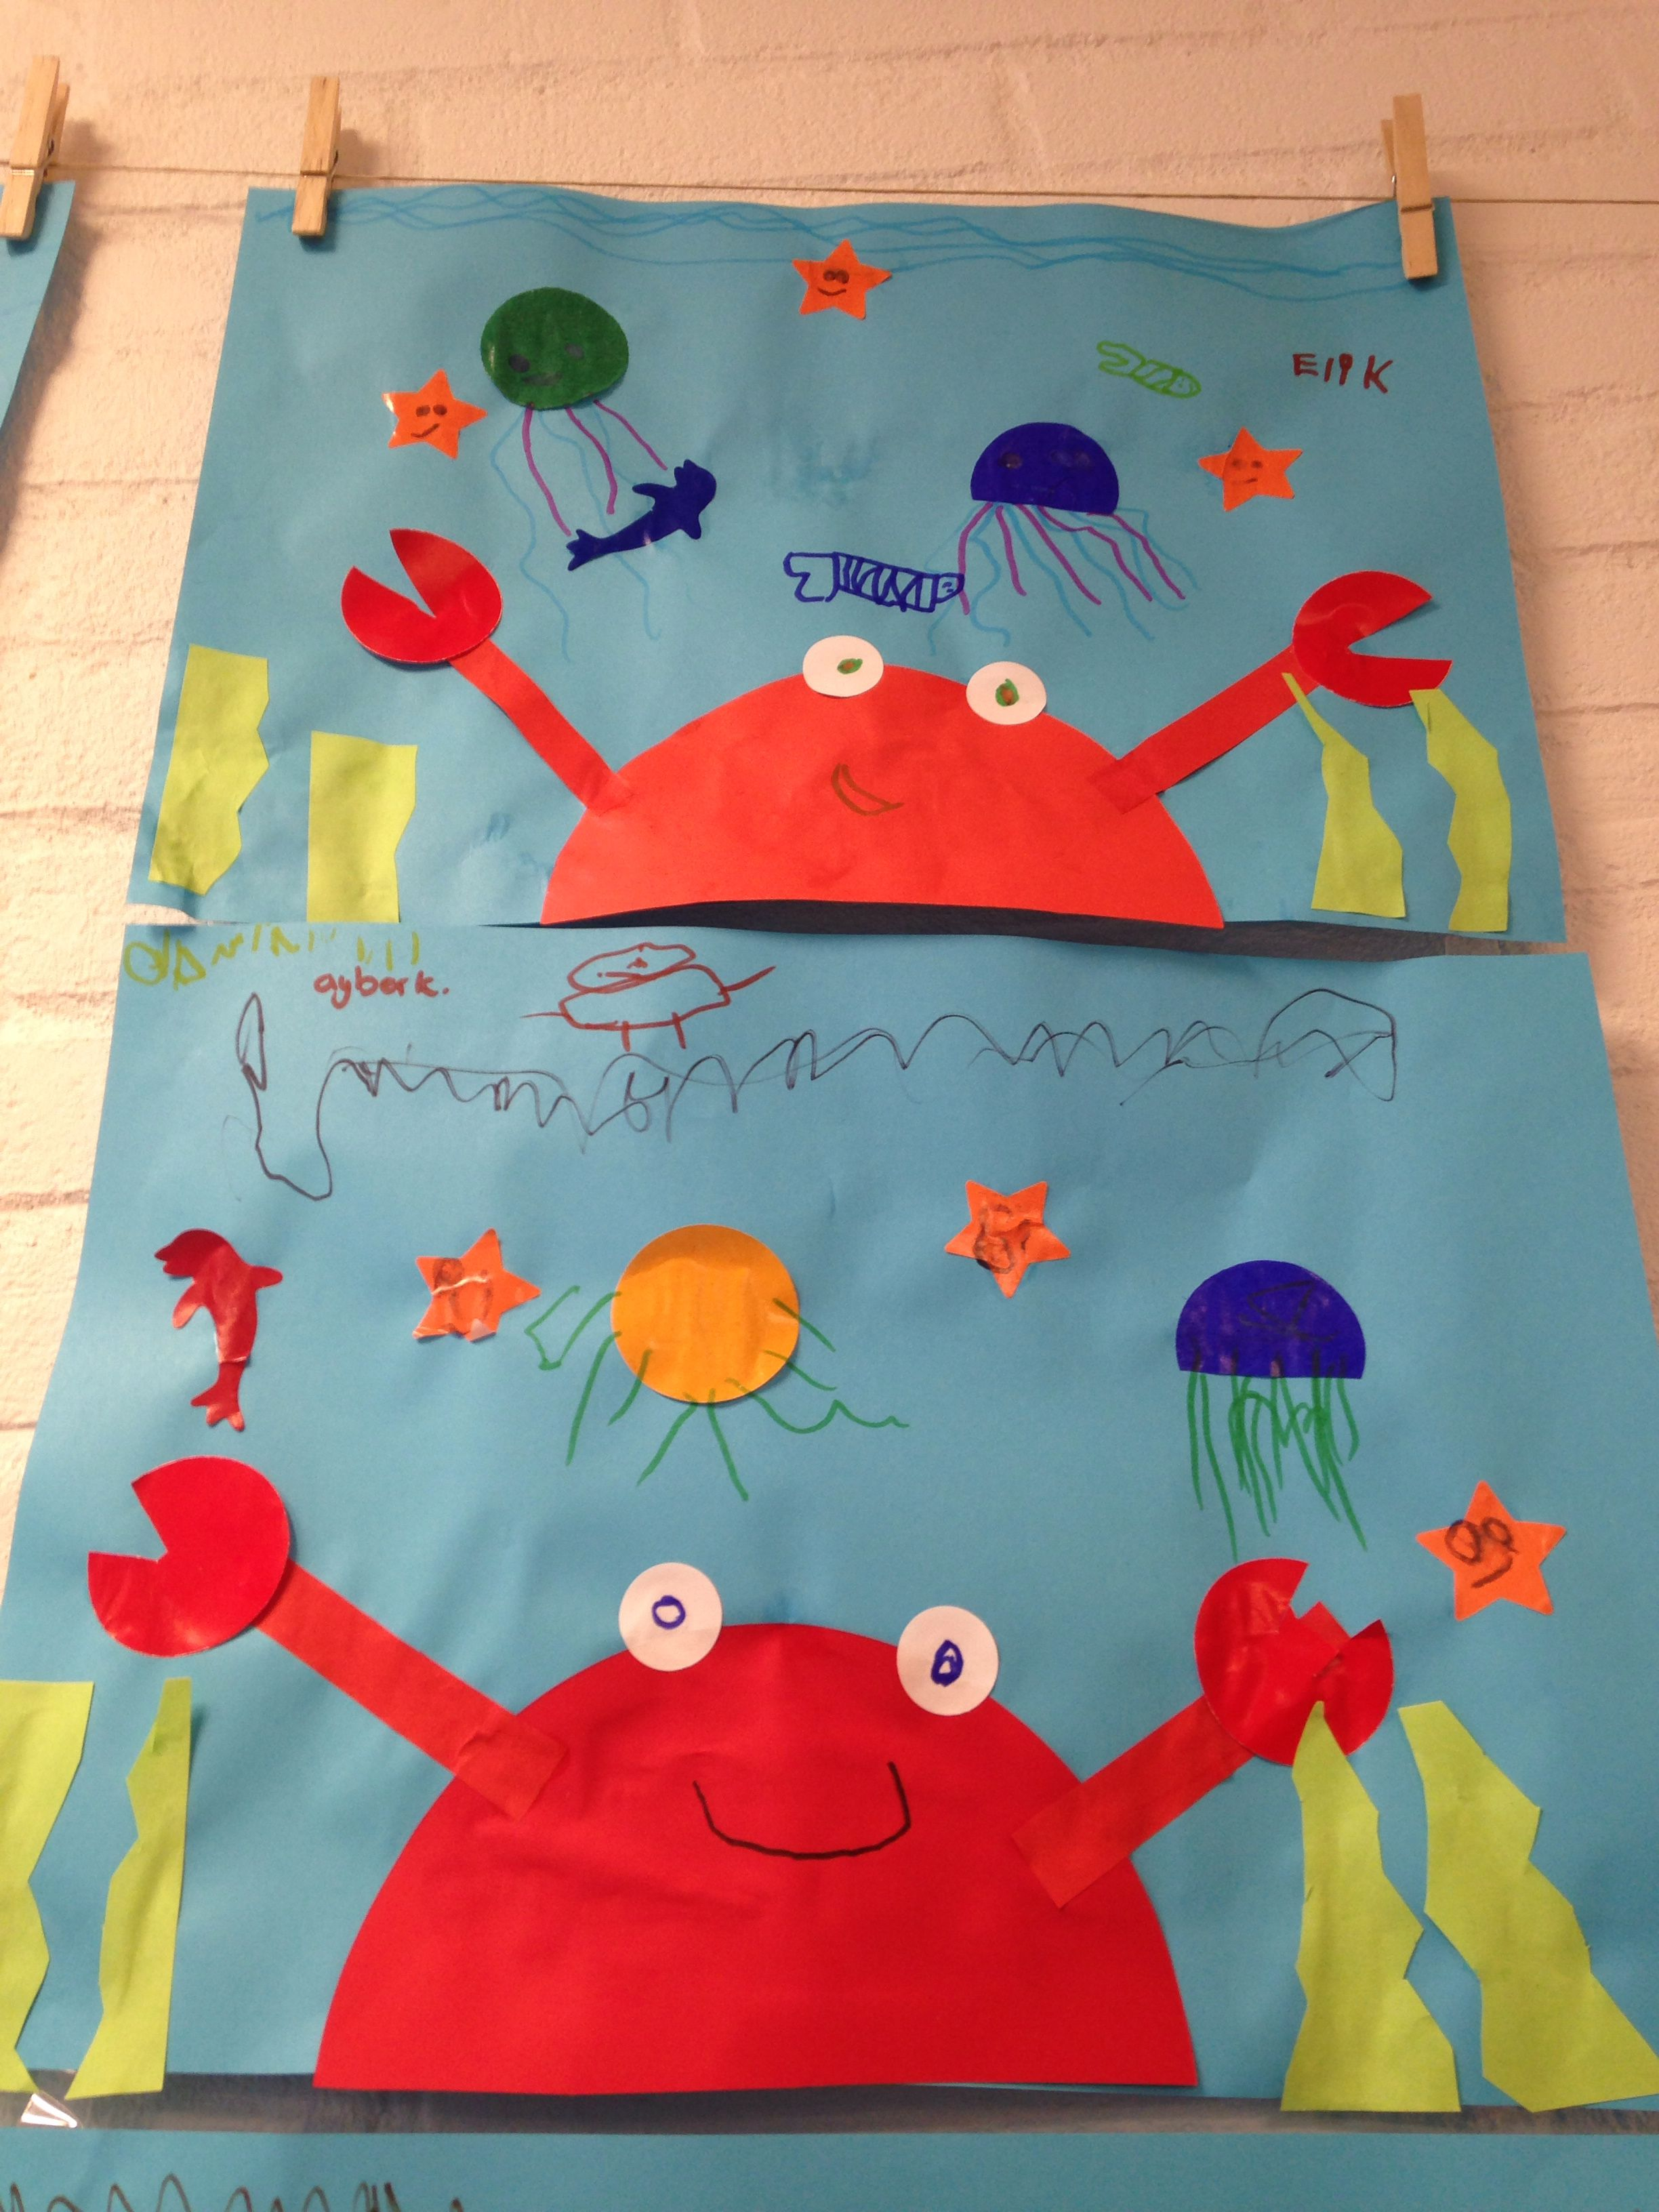 New Zee, dieren, onder water, krab, knutselen, kleuters | thema @NX28